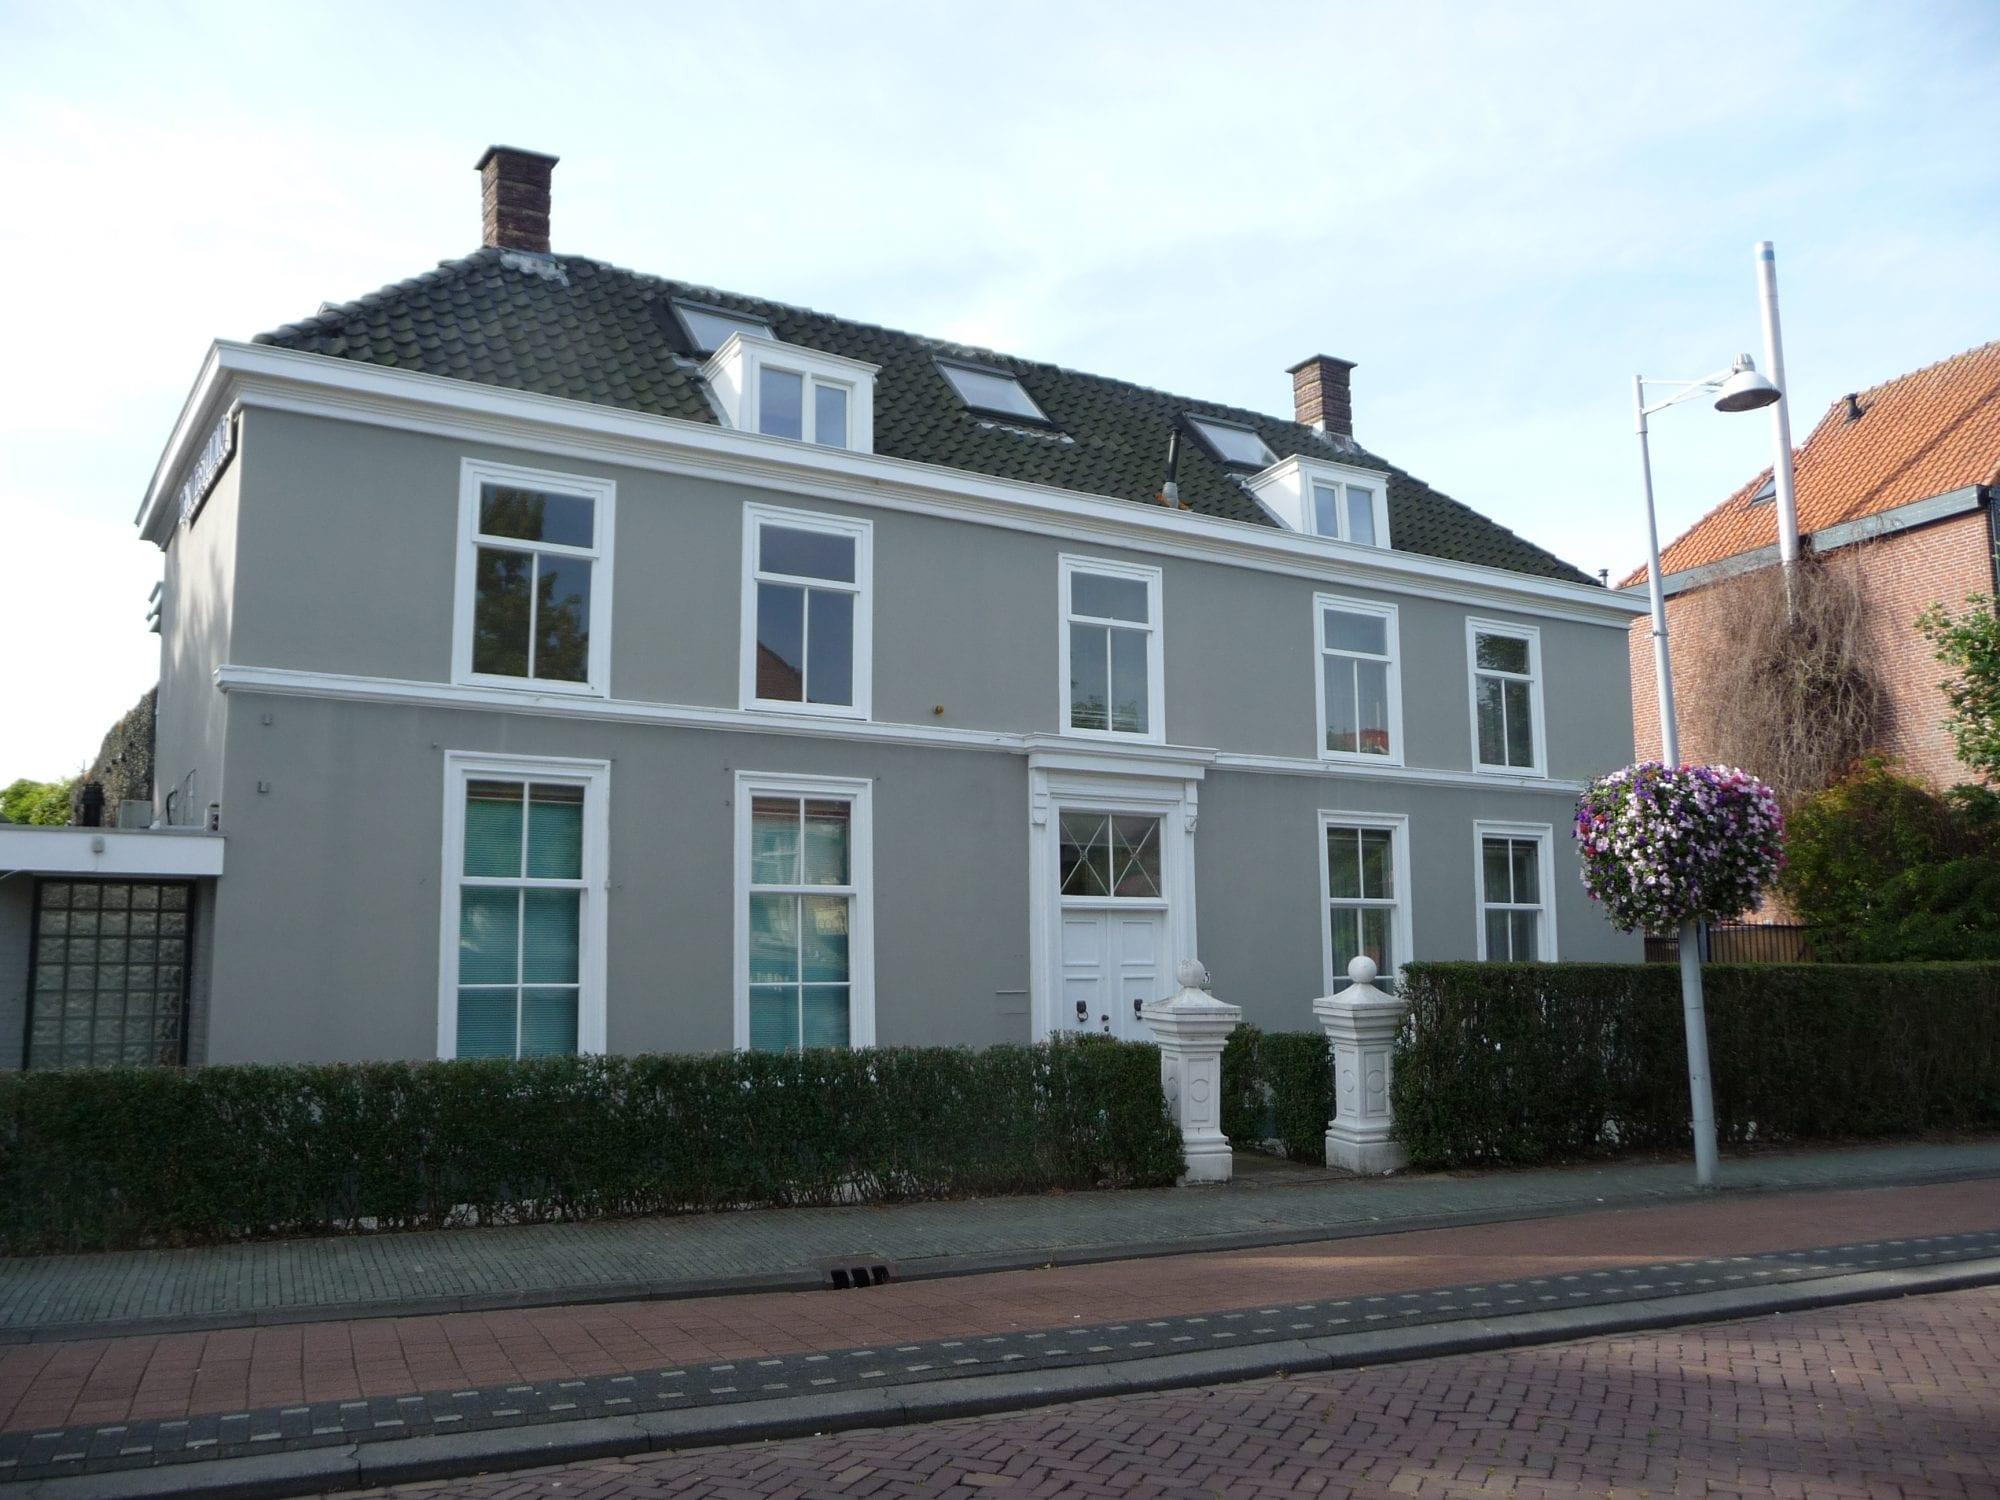 http://www.houseconnect.nl/wp-content/uploads/2016/11/Herenstr-43-Wateringen-41.jpg